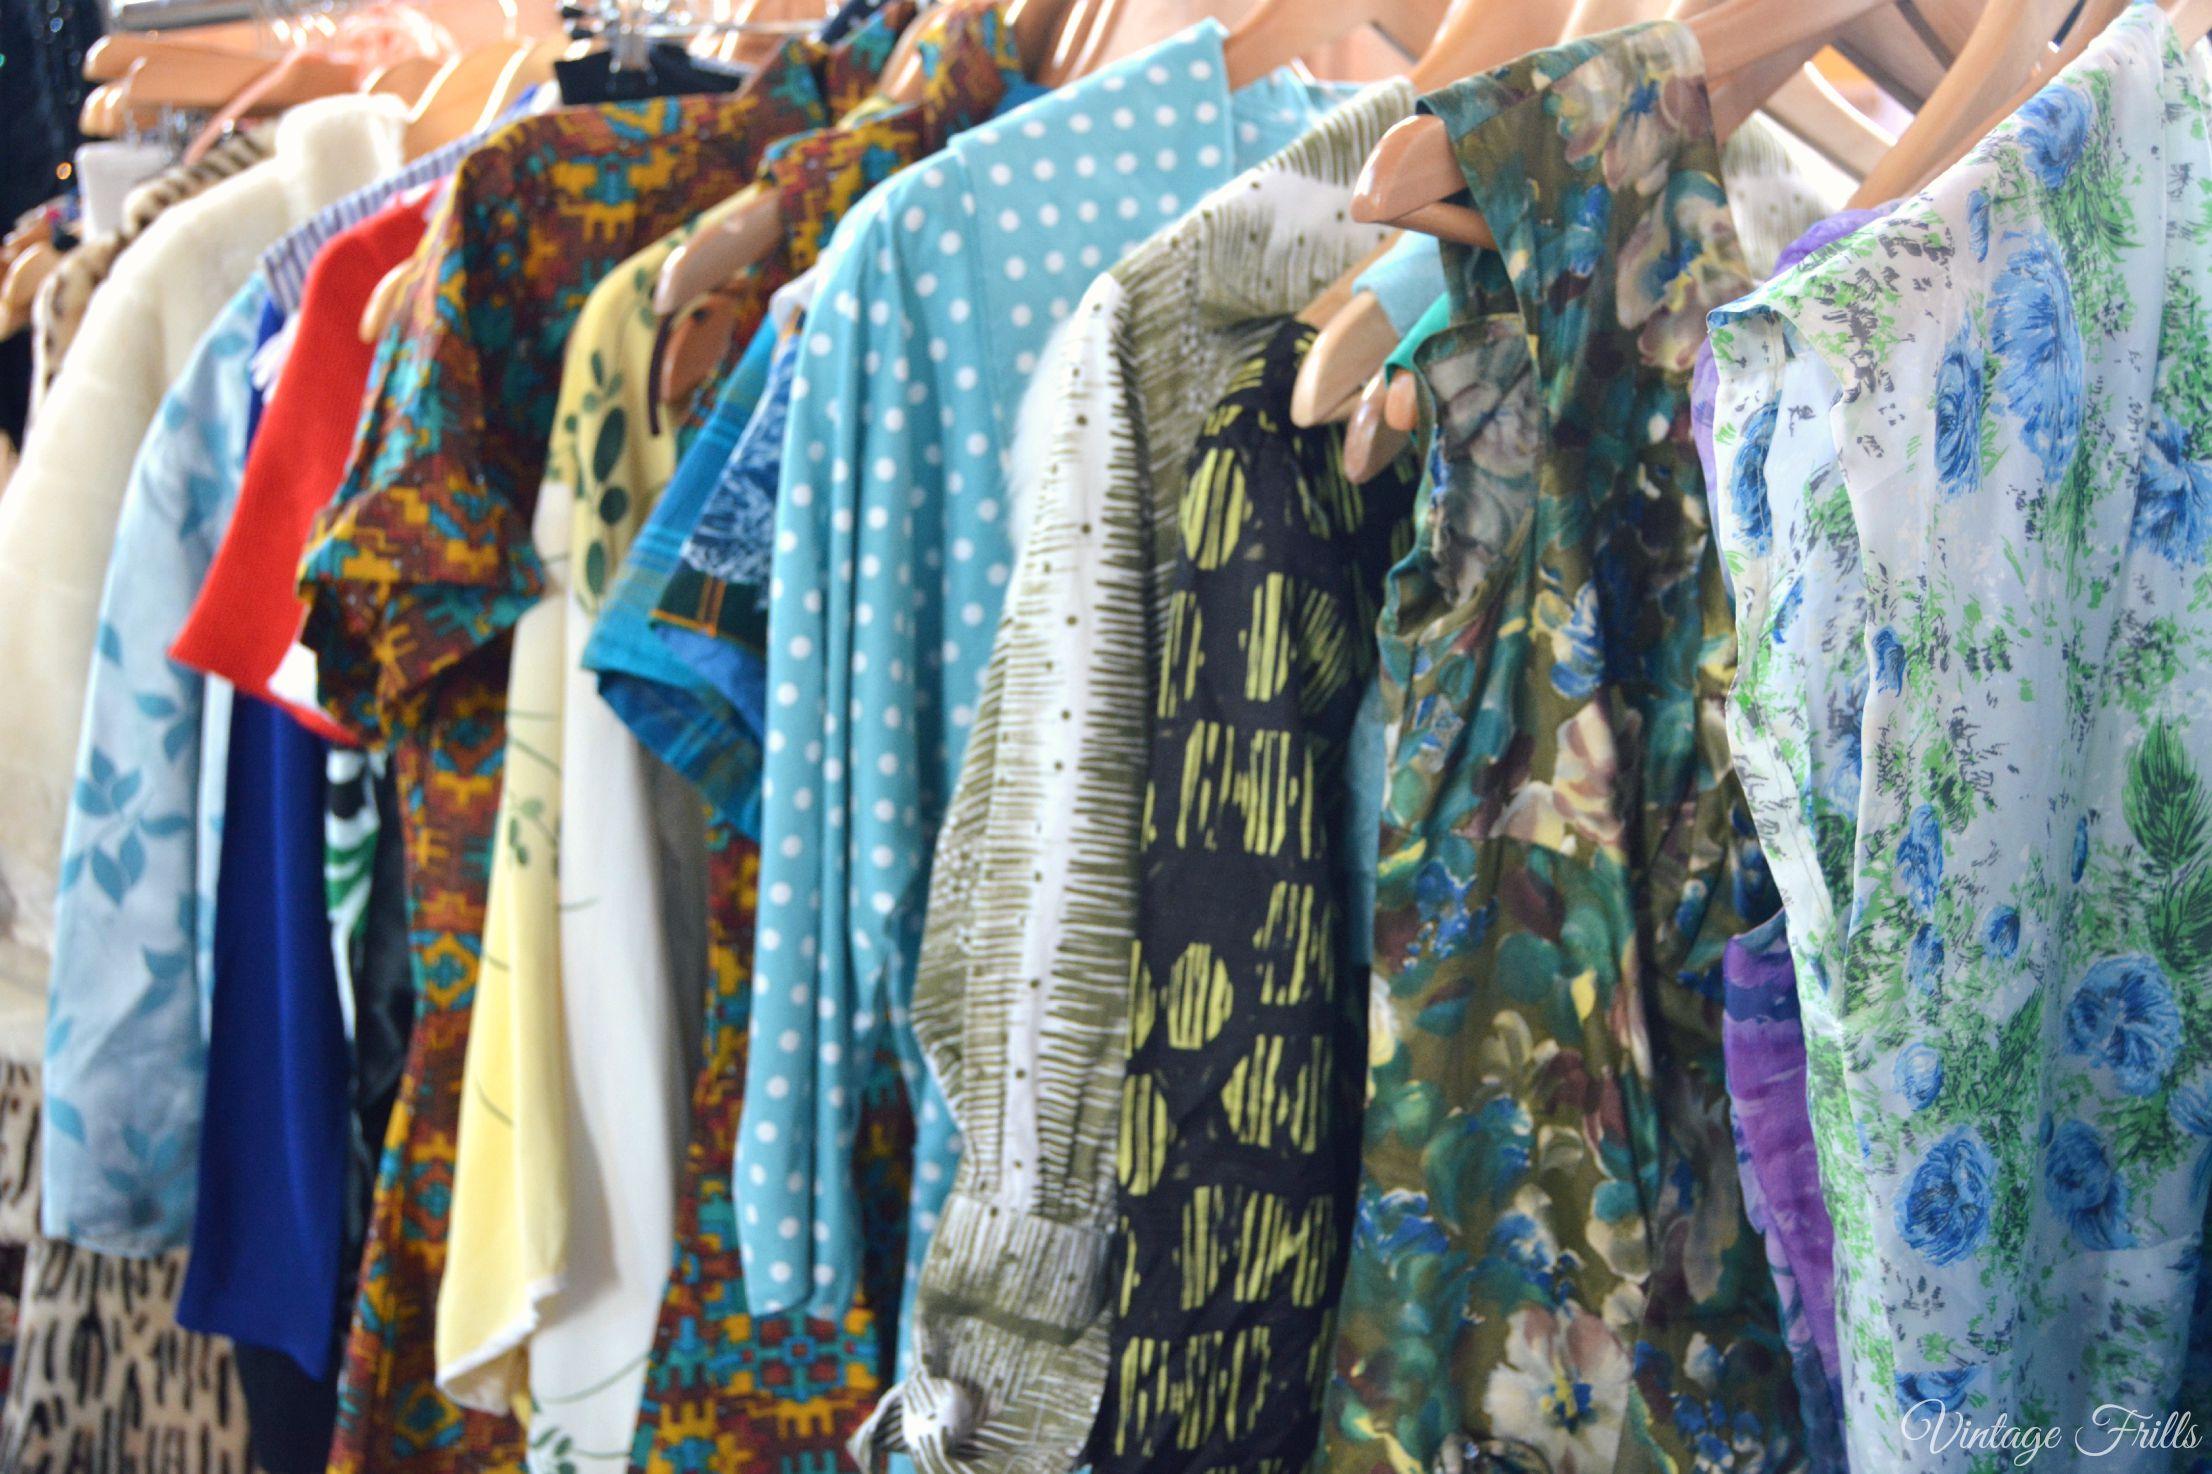 Vintage Dresses at the Midcentury Market